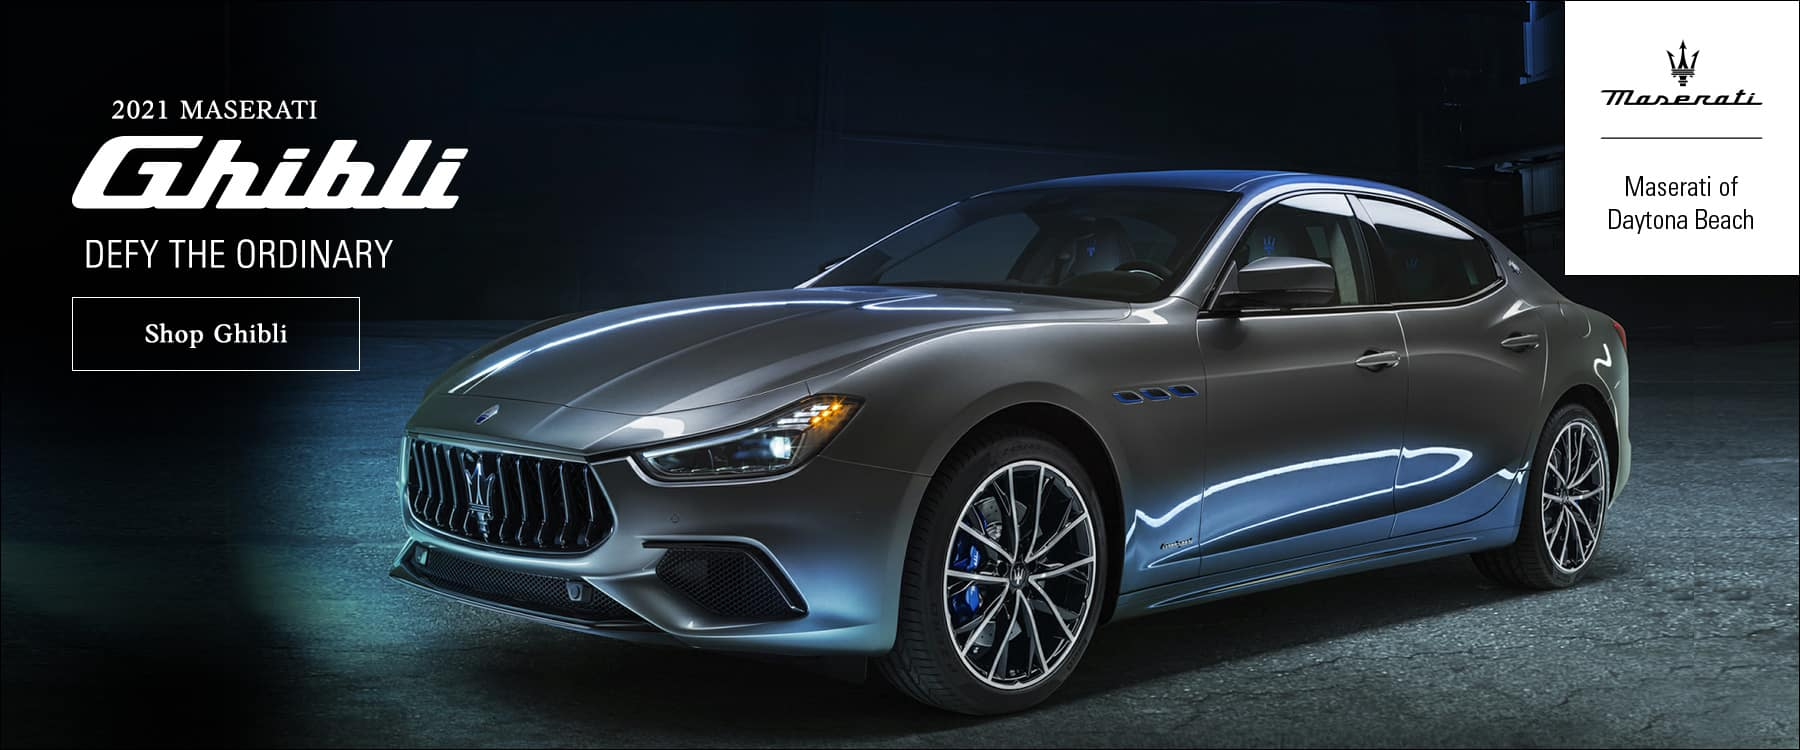 DMAR-2021-Maserati-1800×750-MY21-Ghibli-Evergreen